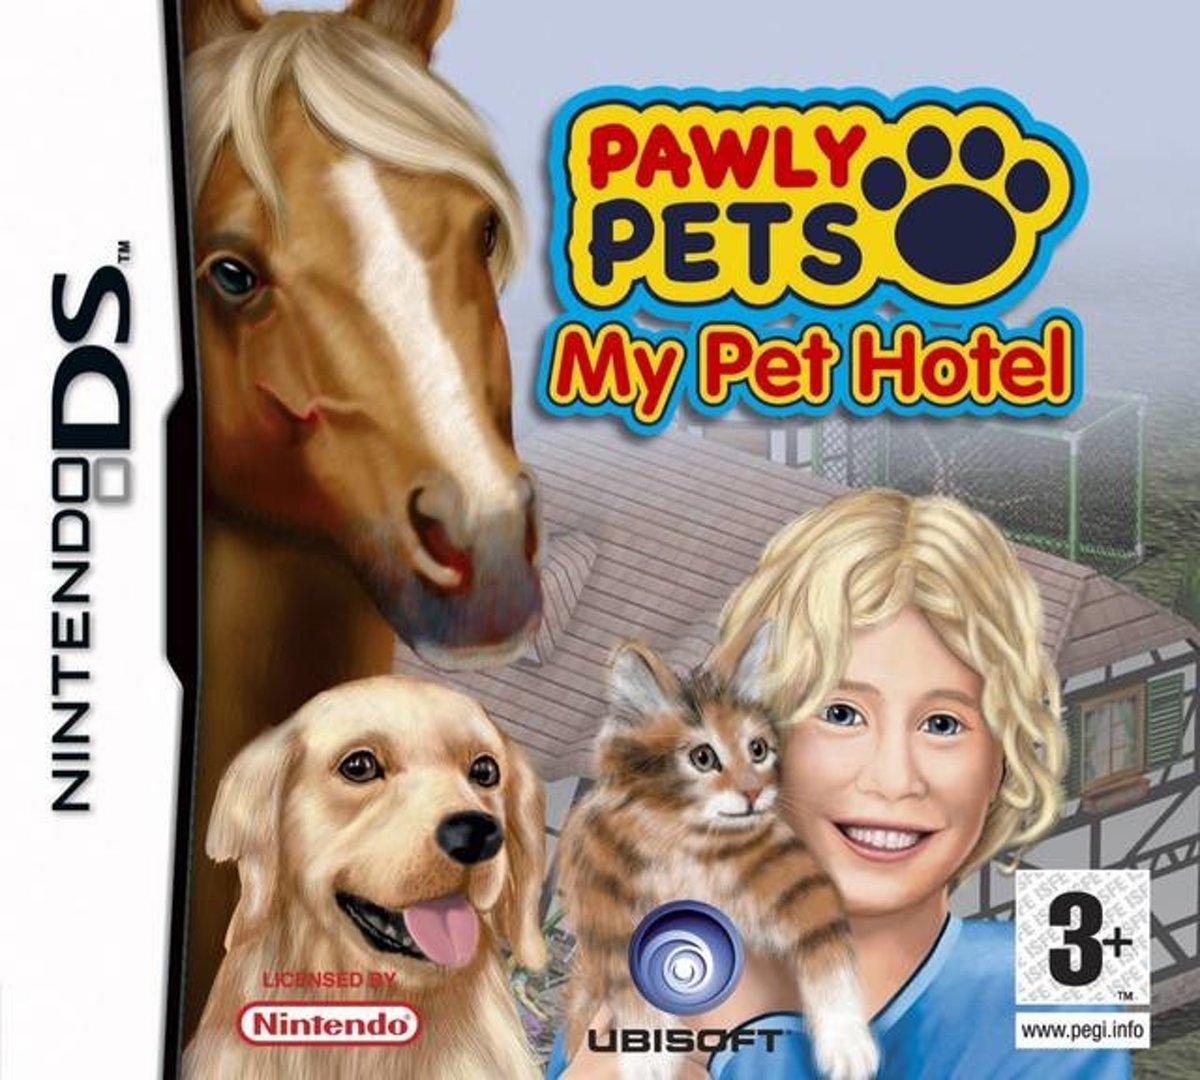 Pawly Pets My Pet Hotel